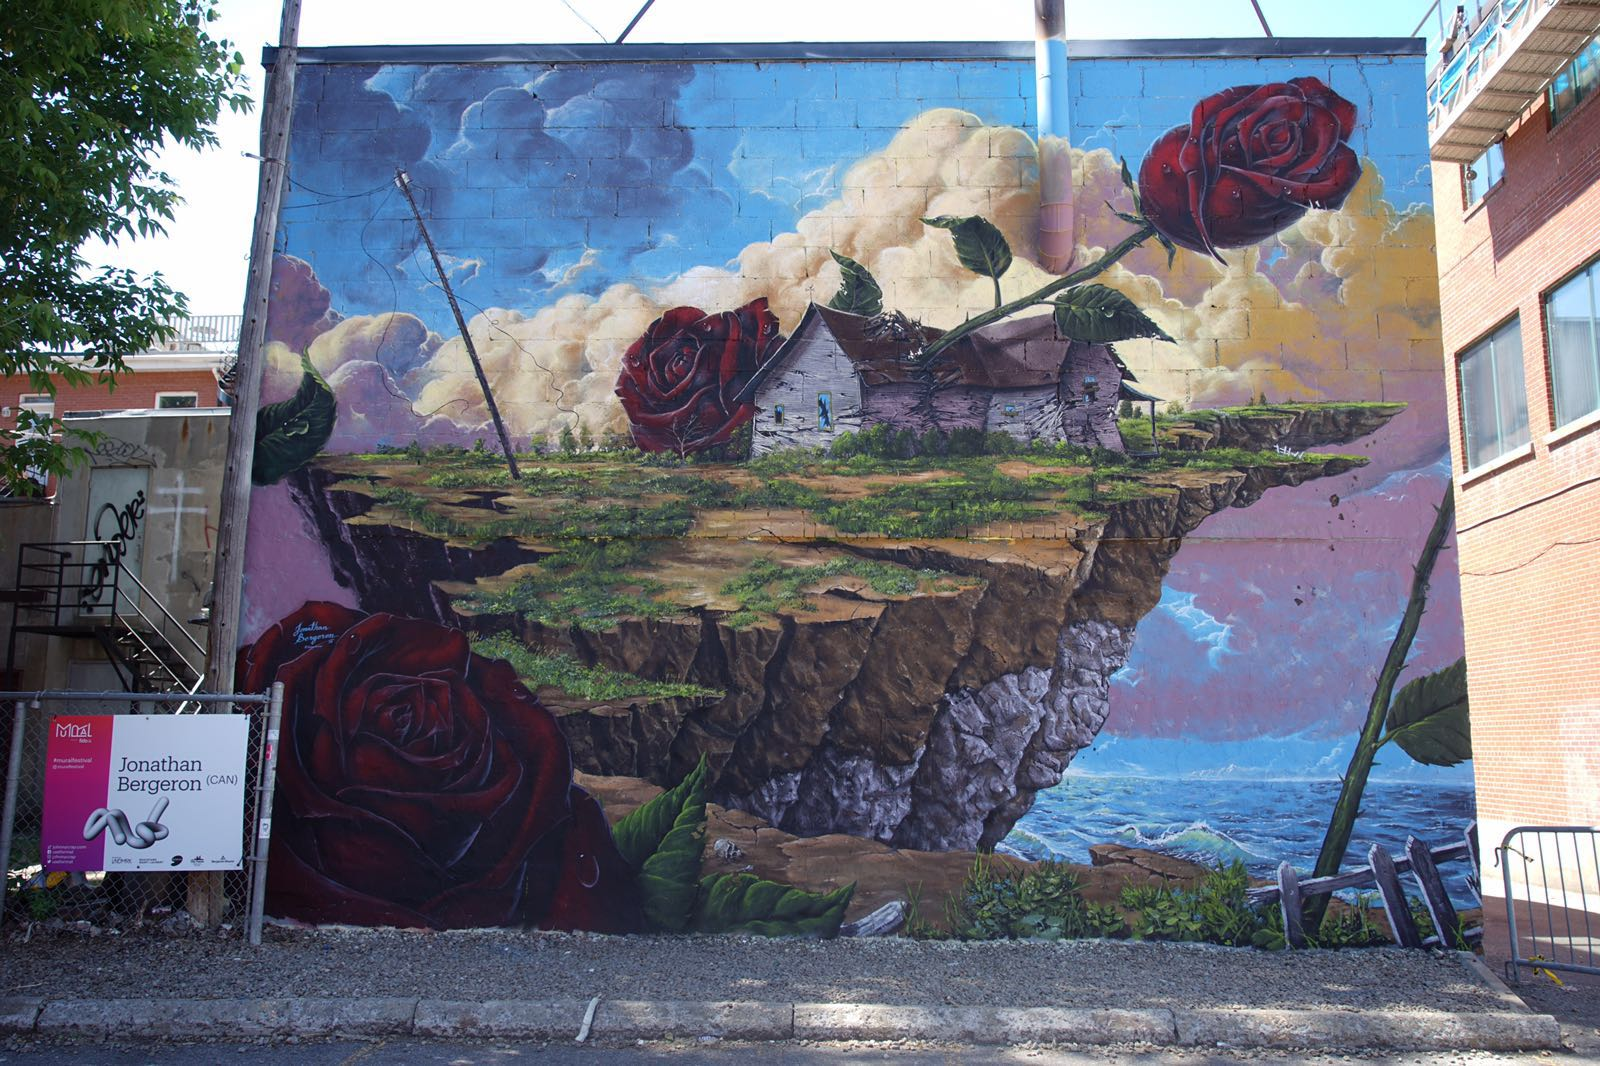 Mural festival 39 16 johnny crap in montreal for Art mural montreal